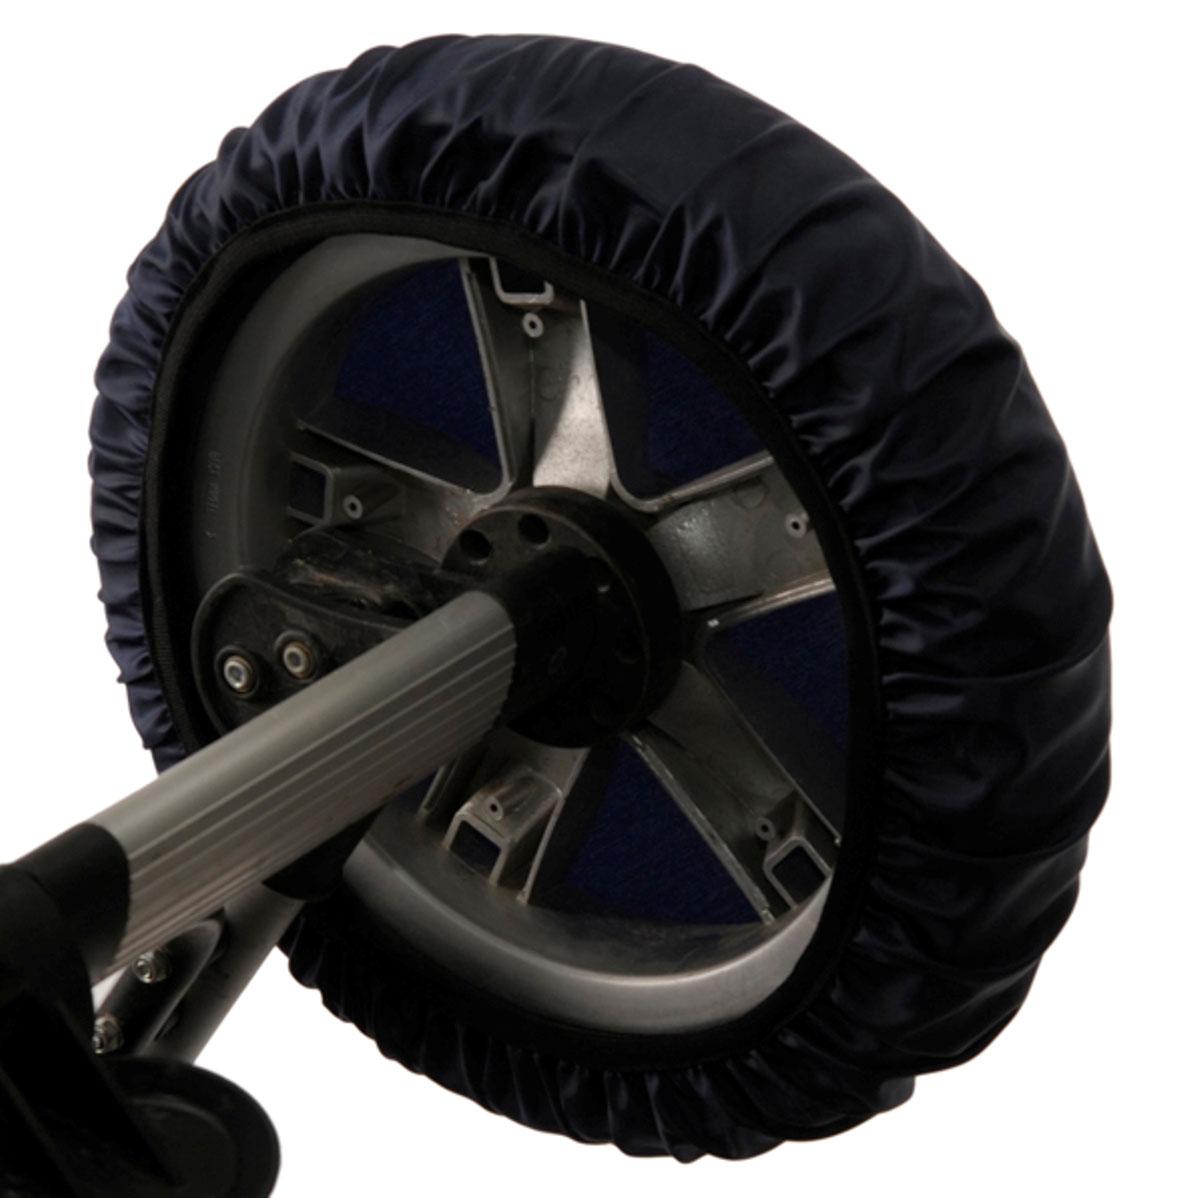 Чудо-Чадо Чехлы на колеса для коляски диаметр 28-38 см цвет темно-синий 2 шт